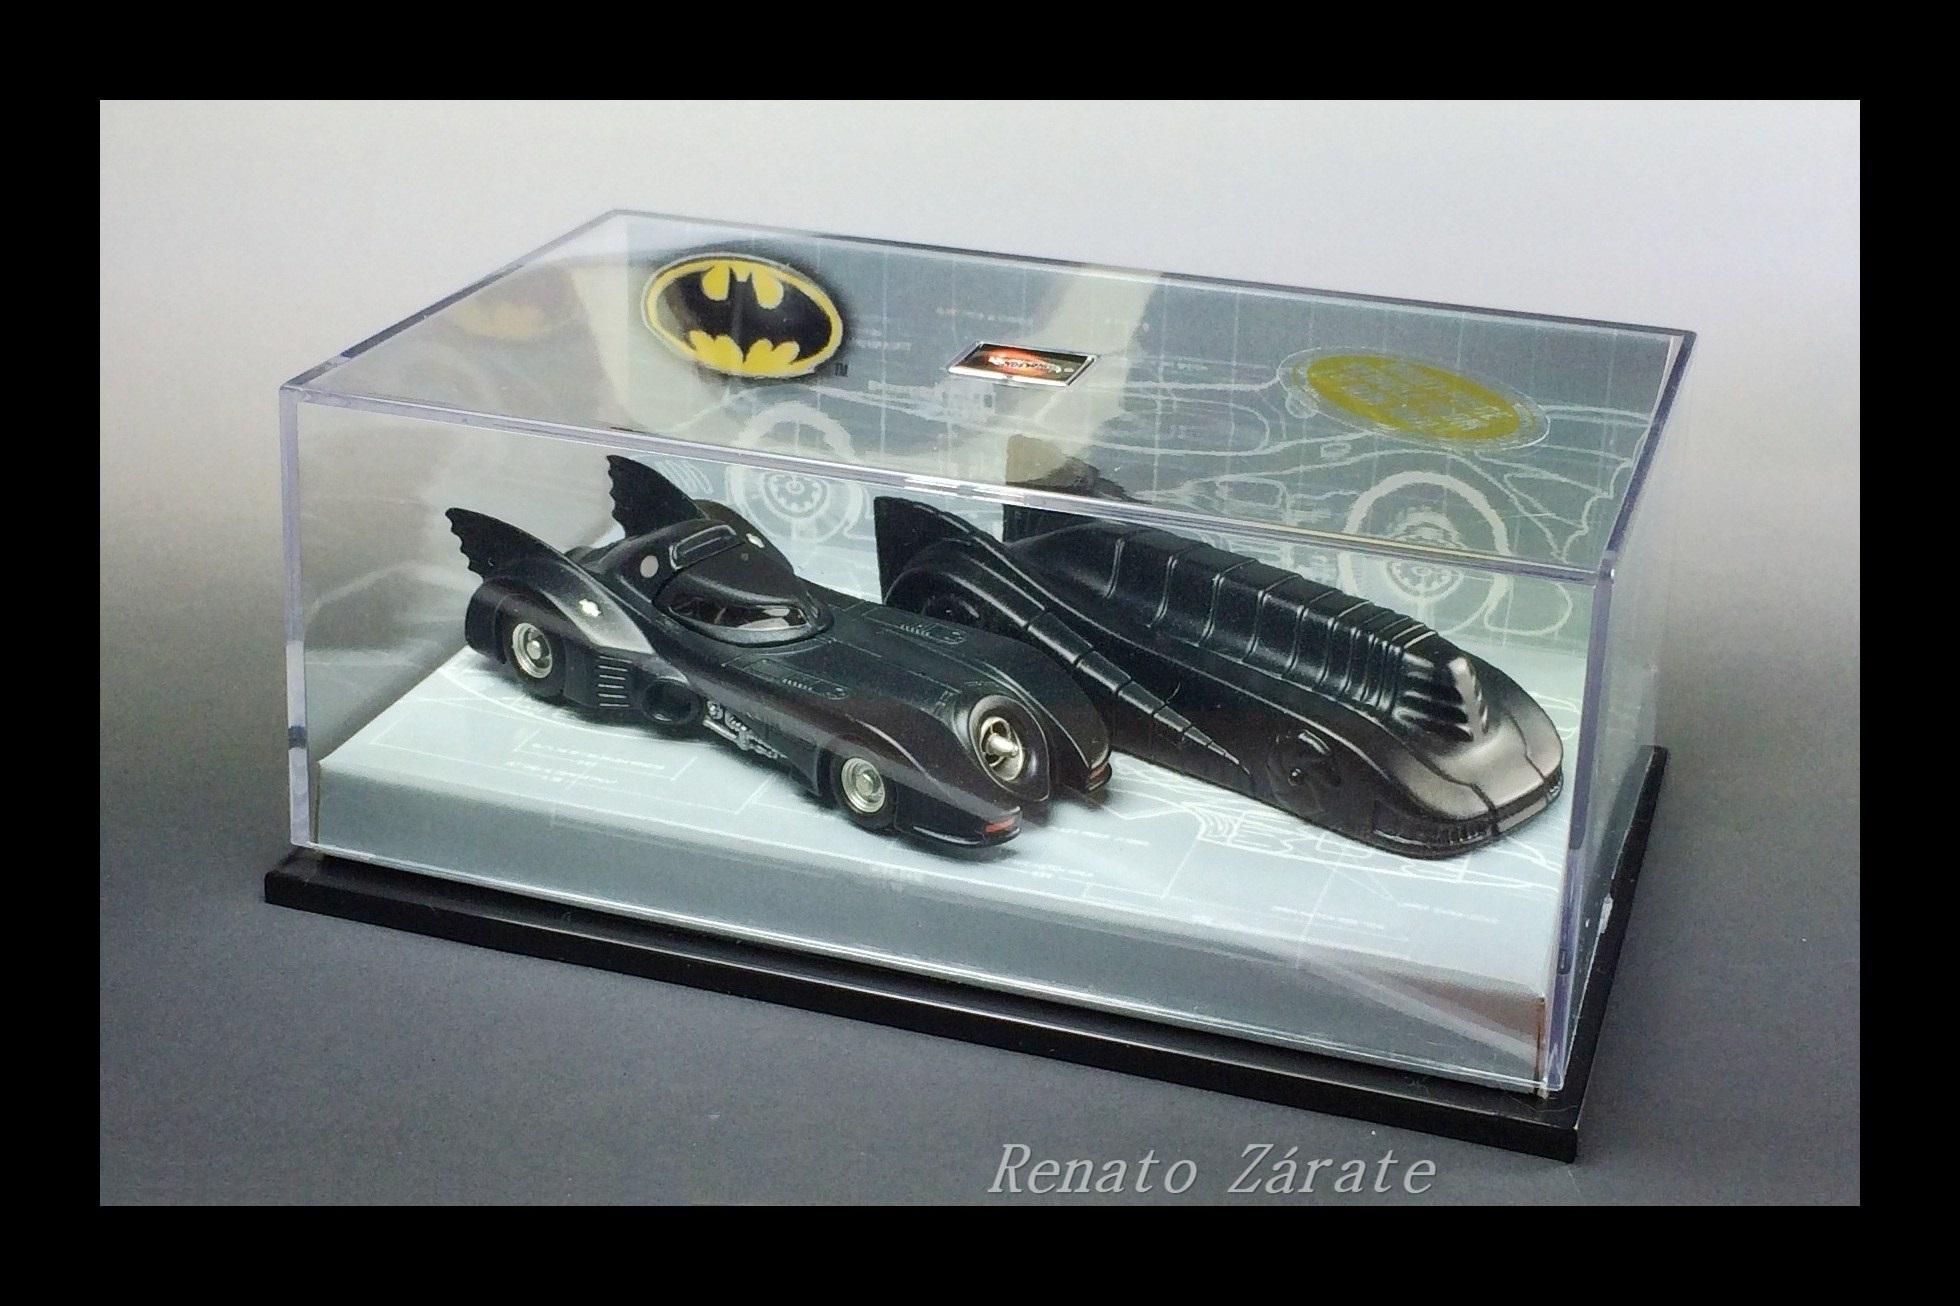 Batman Shields Up 2-Car Set